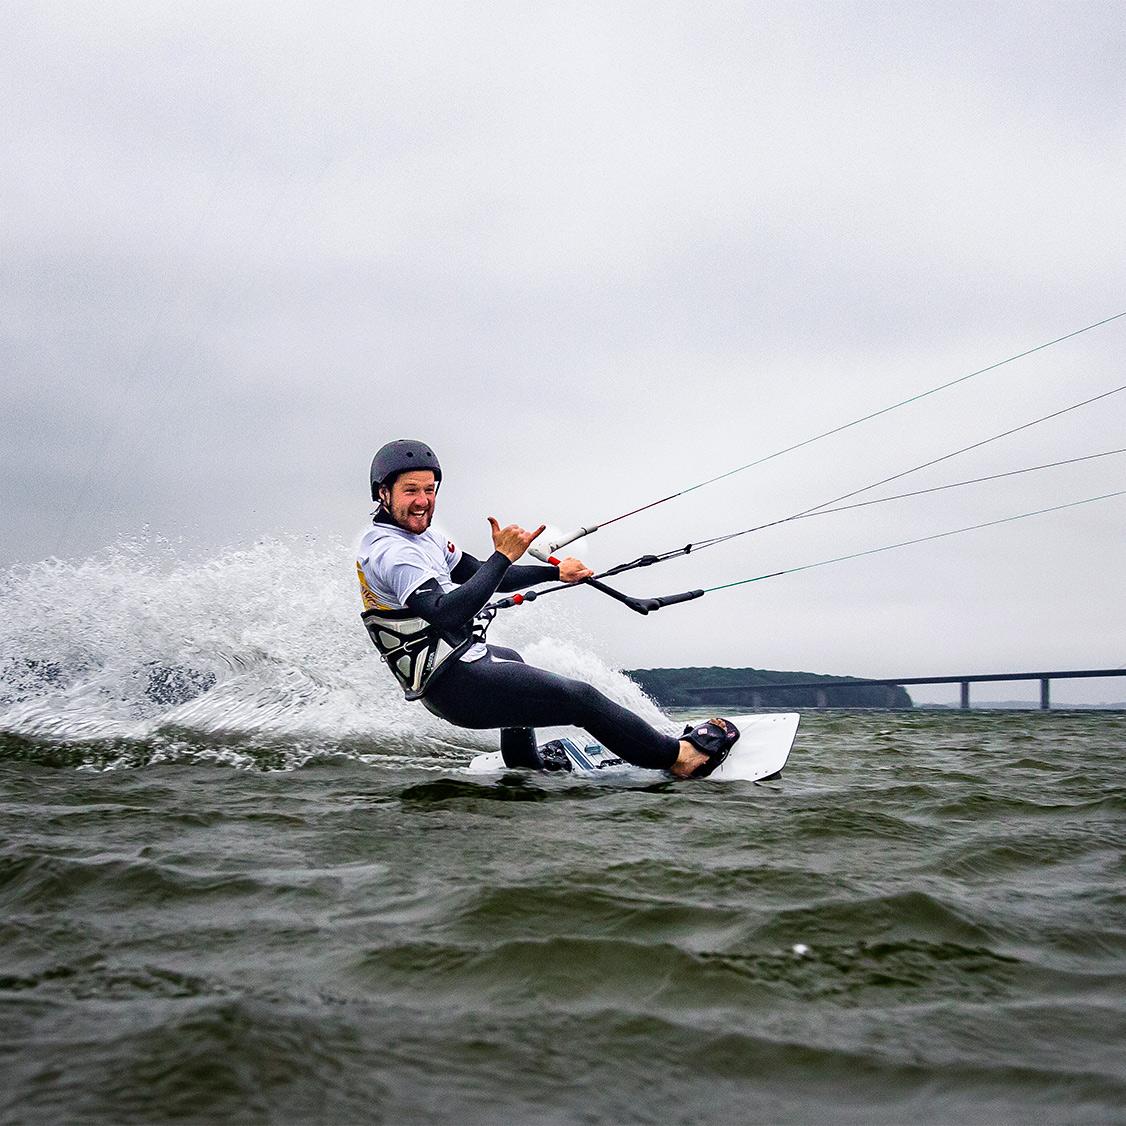 Kitesurfing kursus hos Kitekollektivet